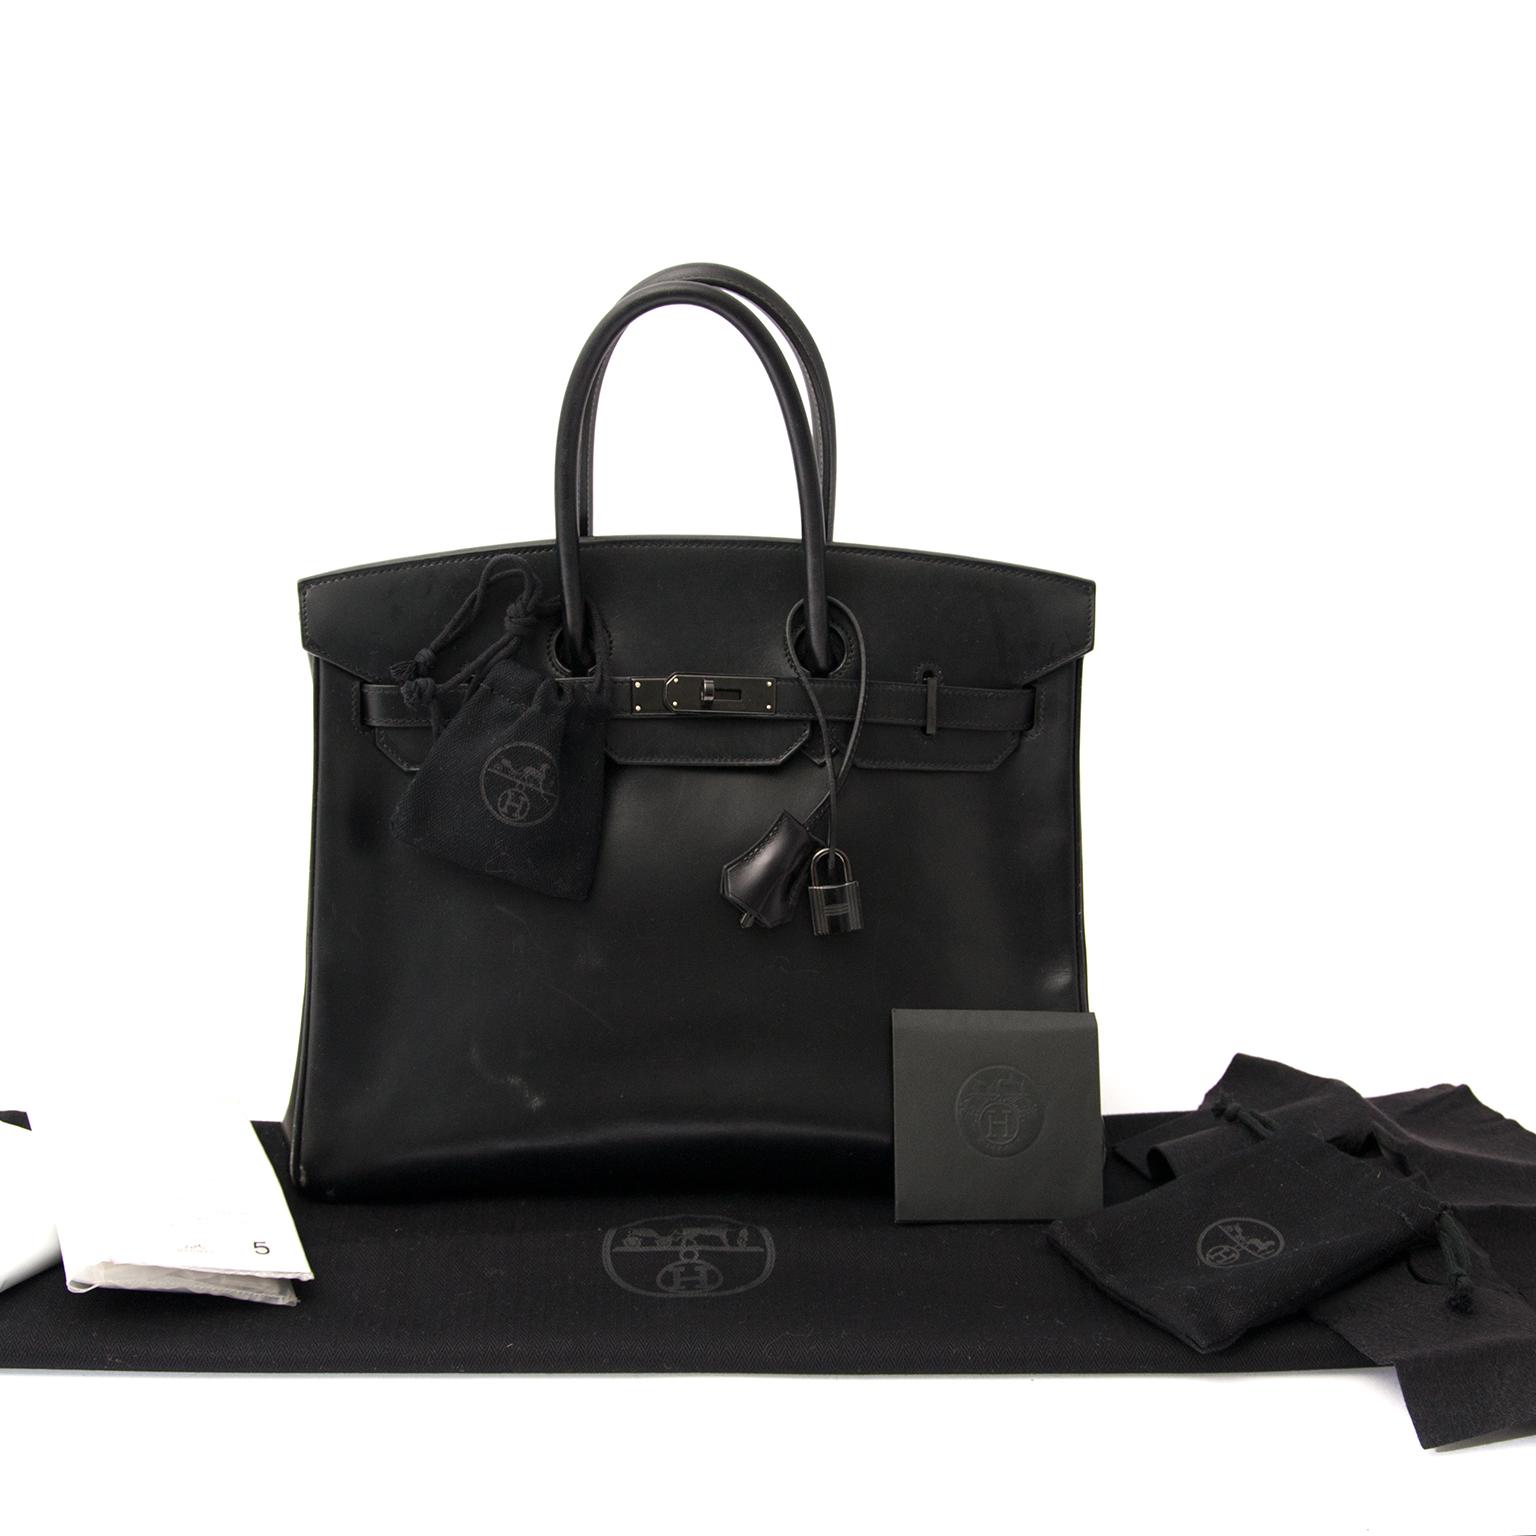 100% authentic Very Rare Limited Hermès Birkin So Black Boxcalf 35cm worldwide shipping